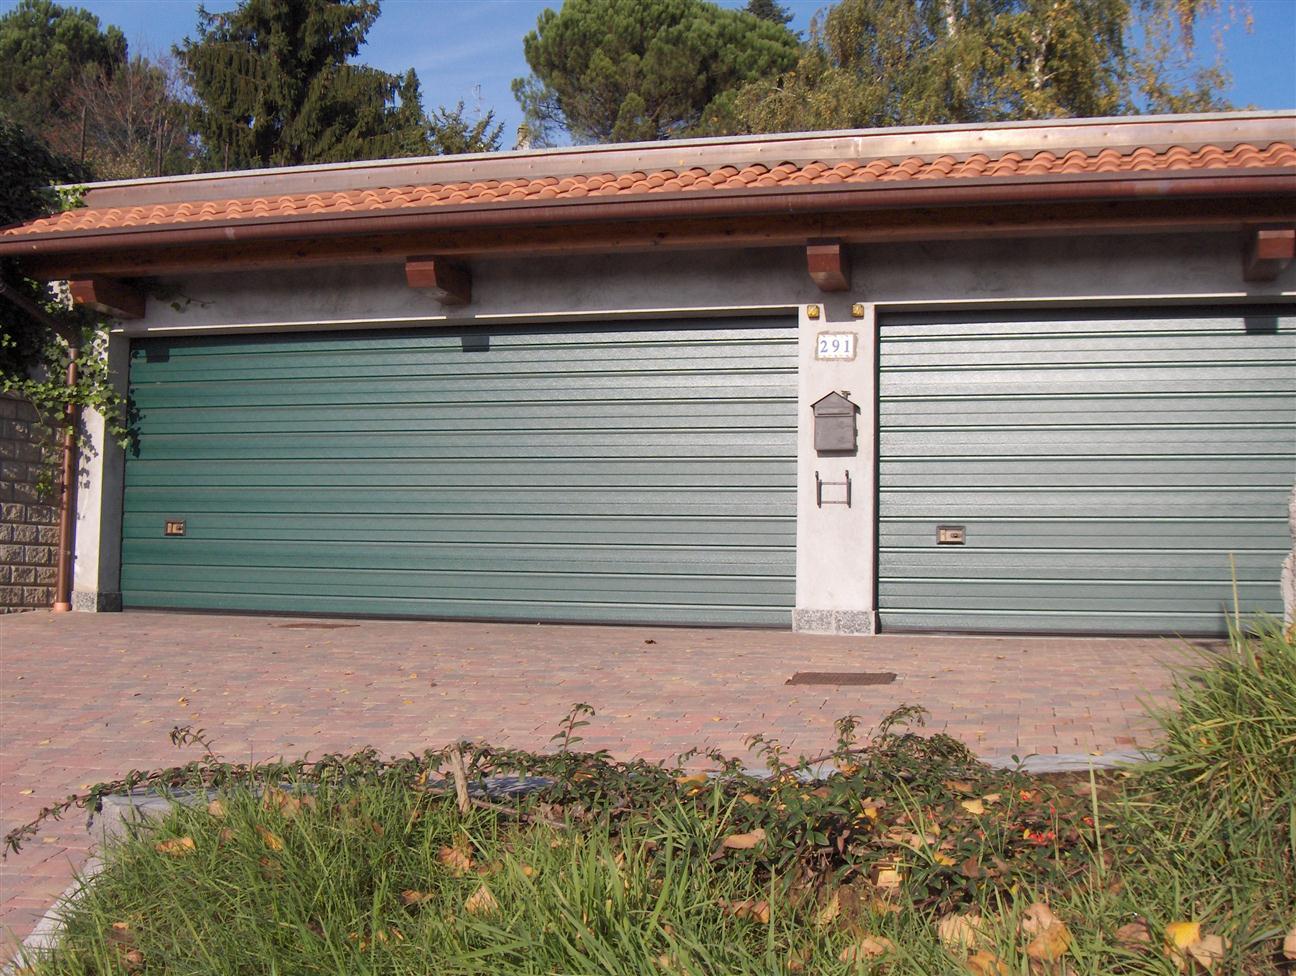 Miglior antifurto per garage - Miglior antifurto casa forum ...